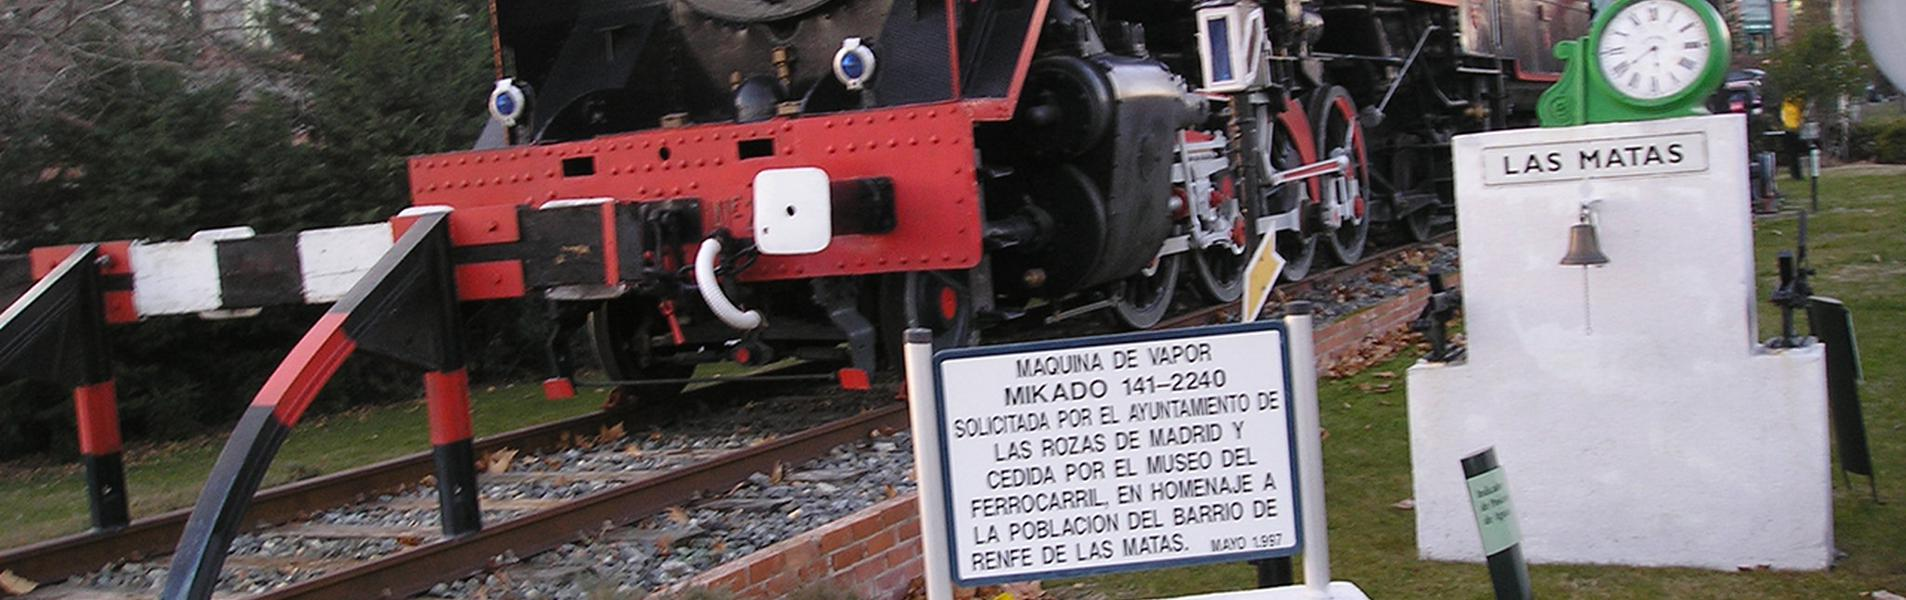 Museo de Ferrocarril de Las Matas